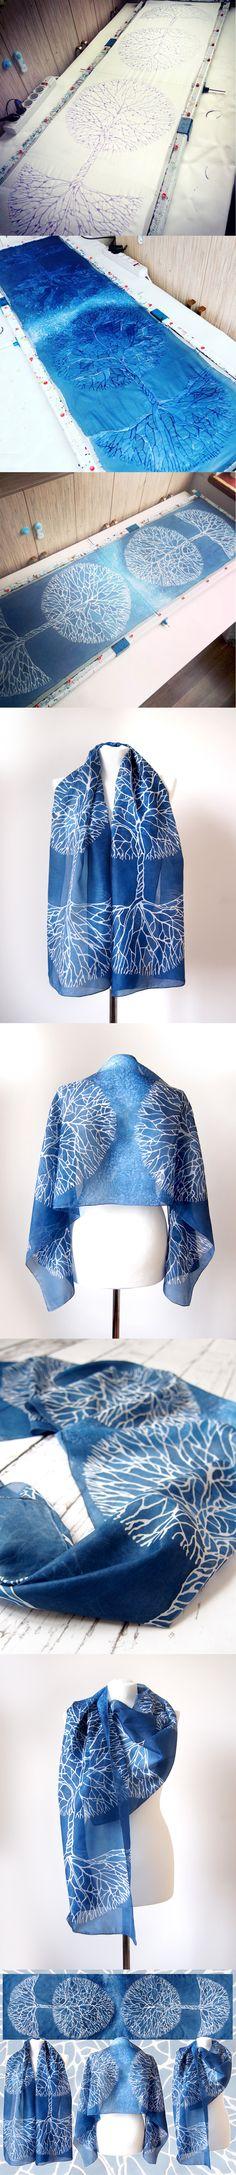 White Trees on a navy blue scarf! #silkscarf #navyscarf #navy #navyblue #minkulul #treescarf #silk #paintingonsilk